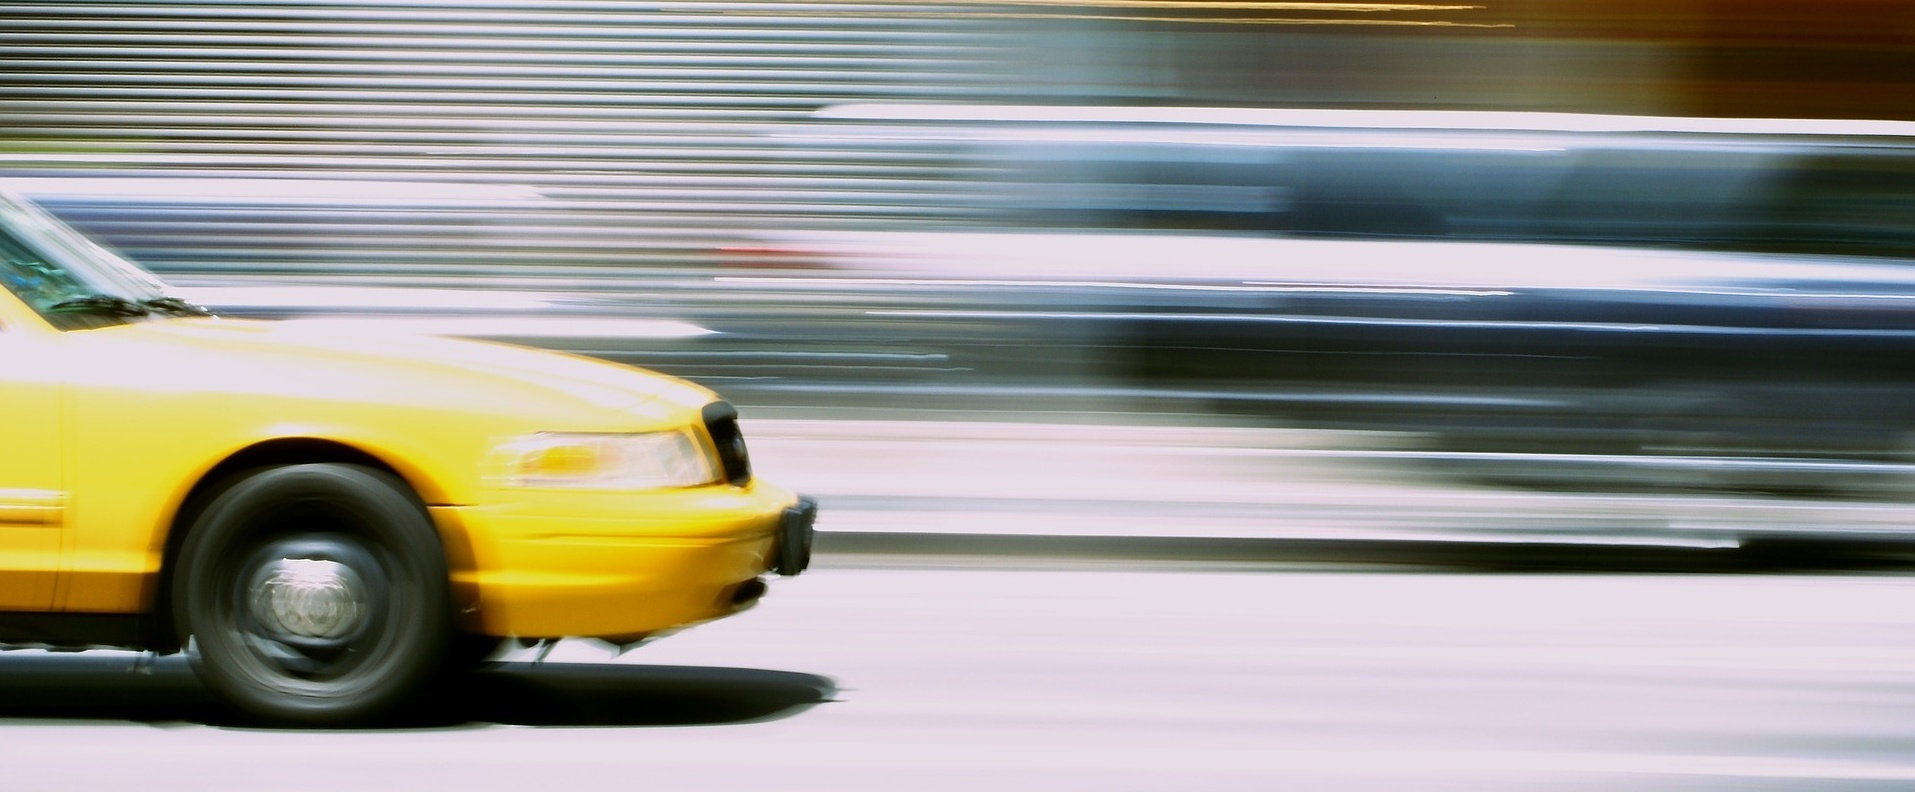 taxi, car, cab, fast